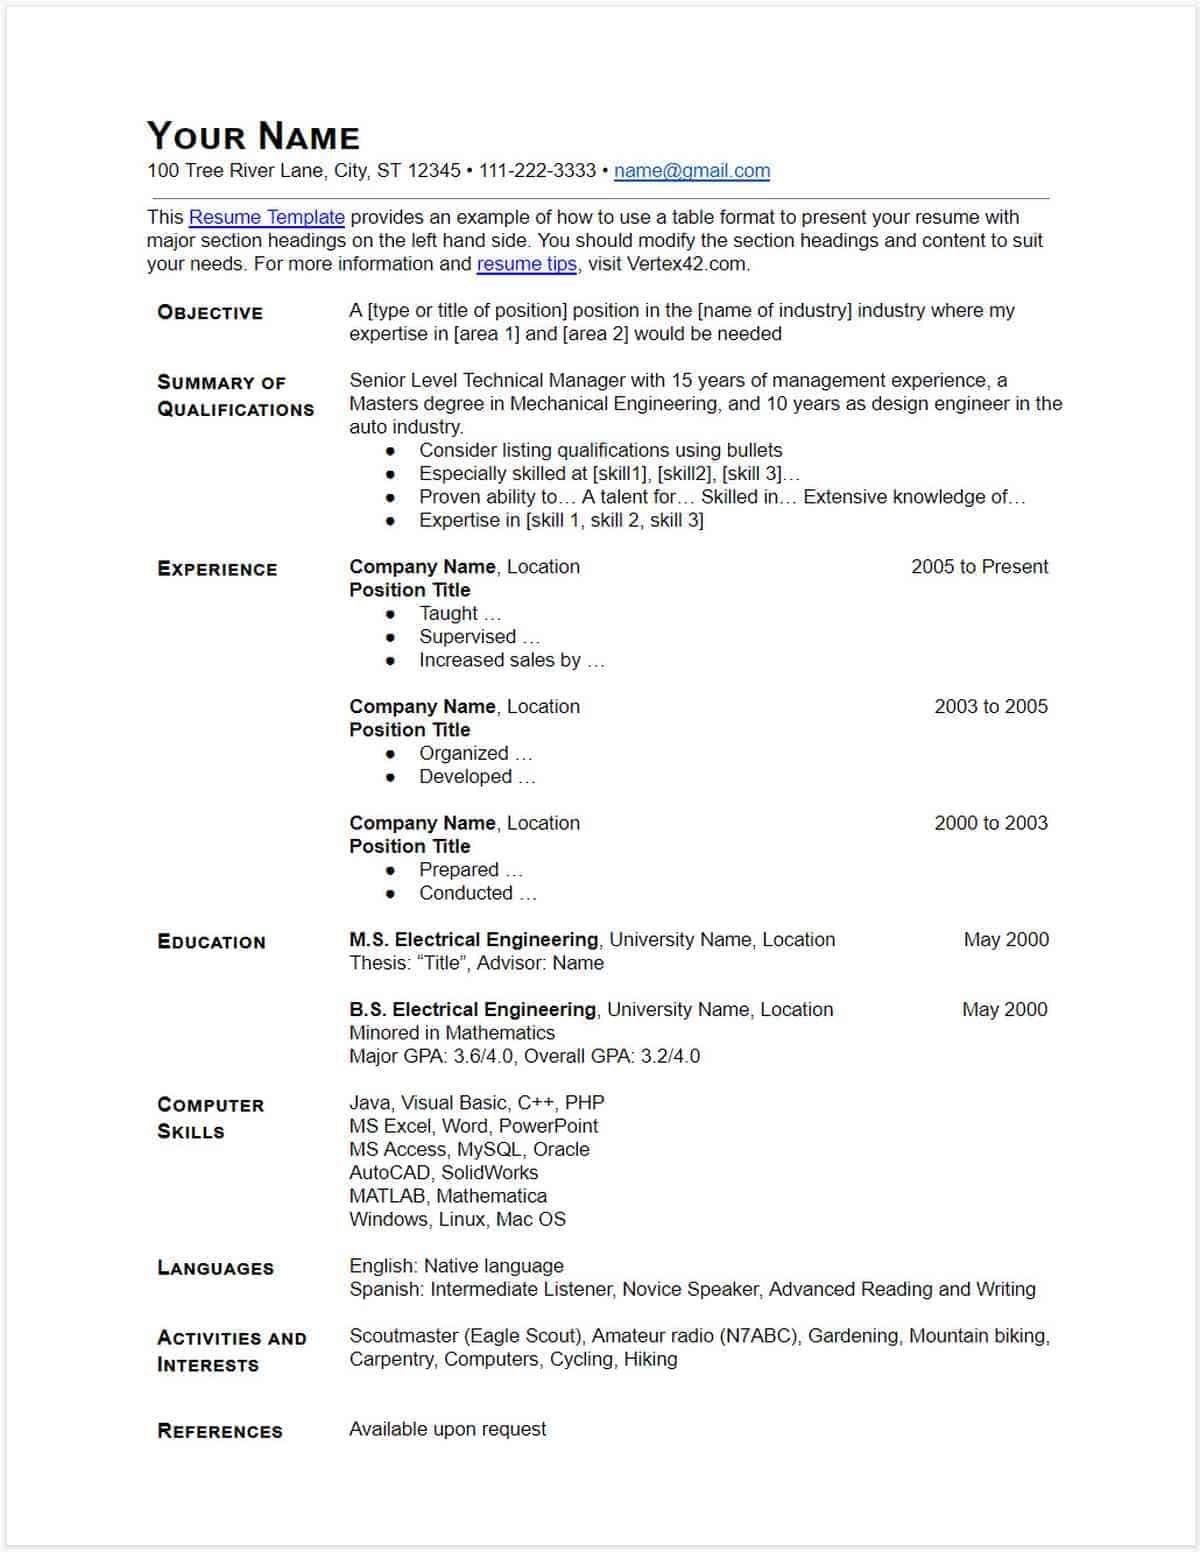 30 Google Docs Resume Templates [Downloadable PDFs